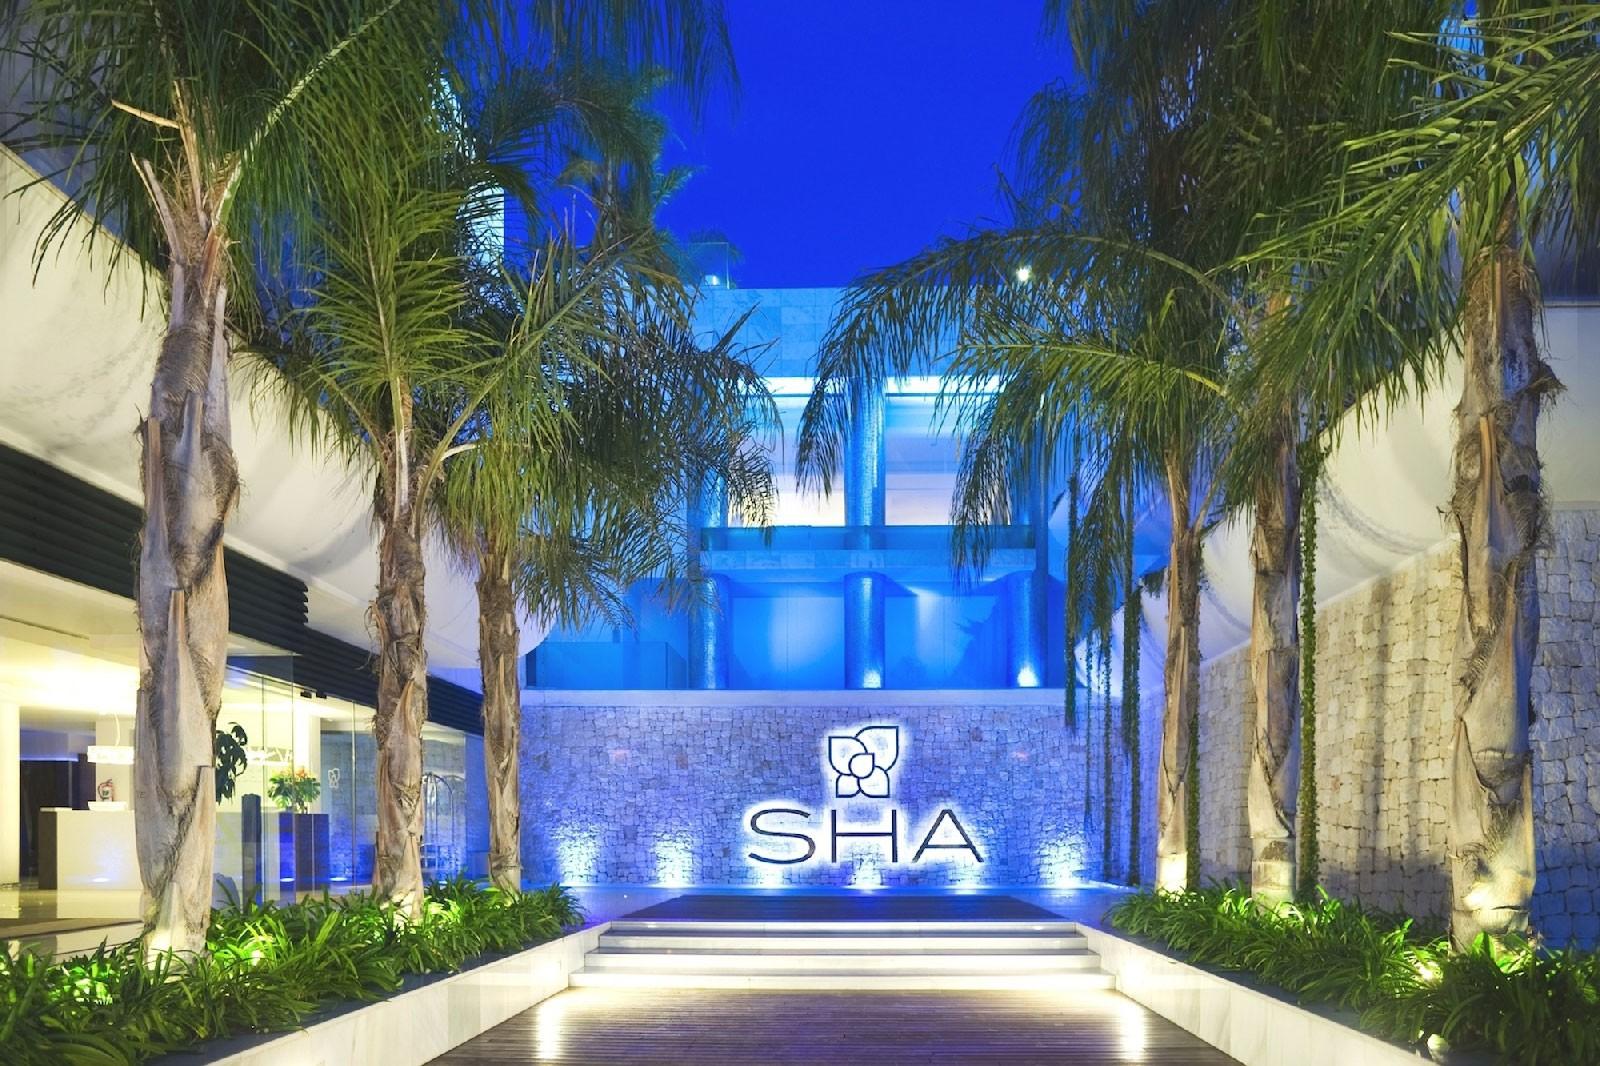 SHA Wellness Clinic Bilder | Bild 1